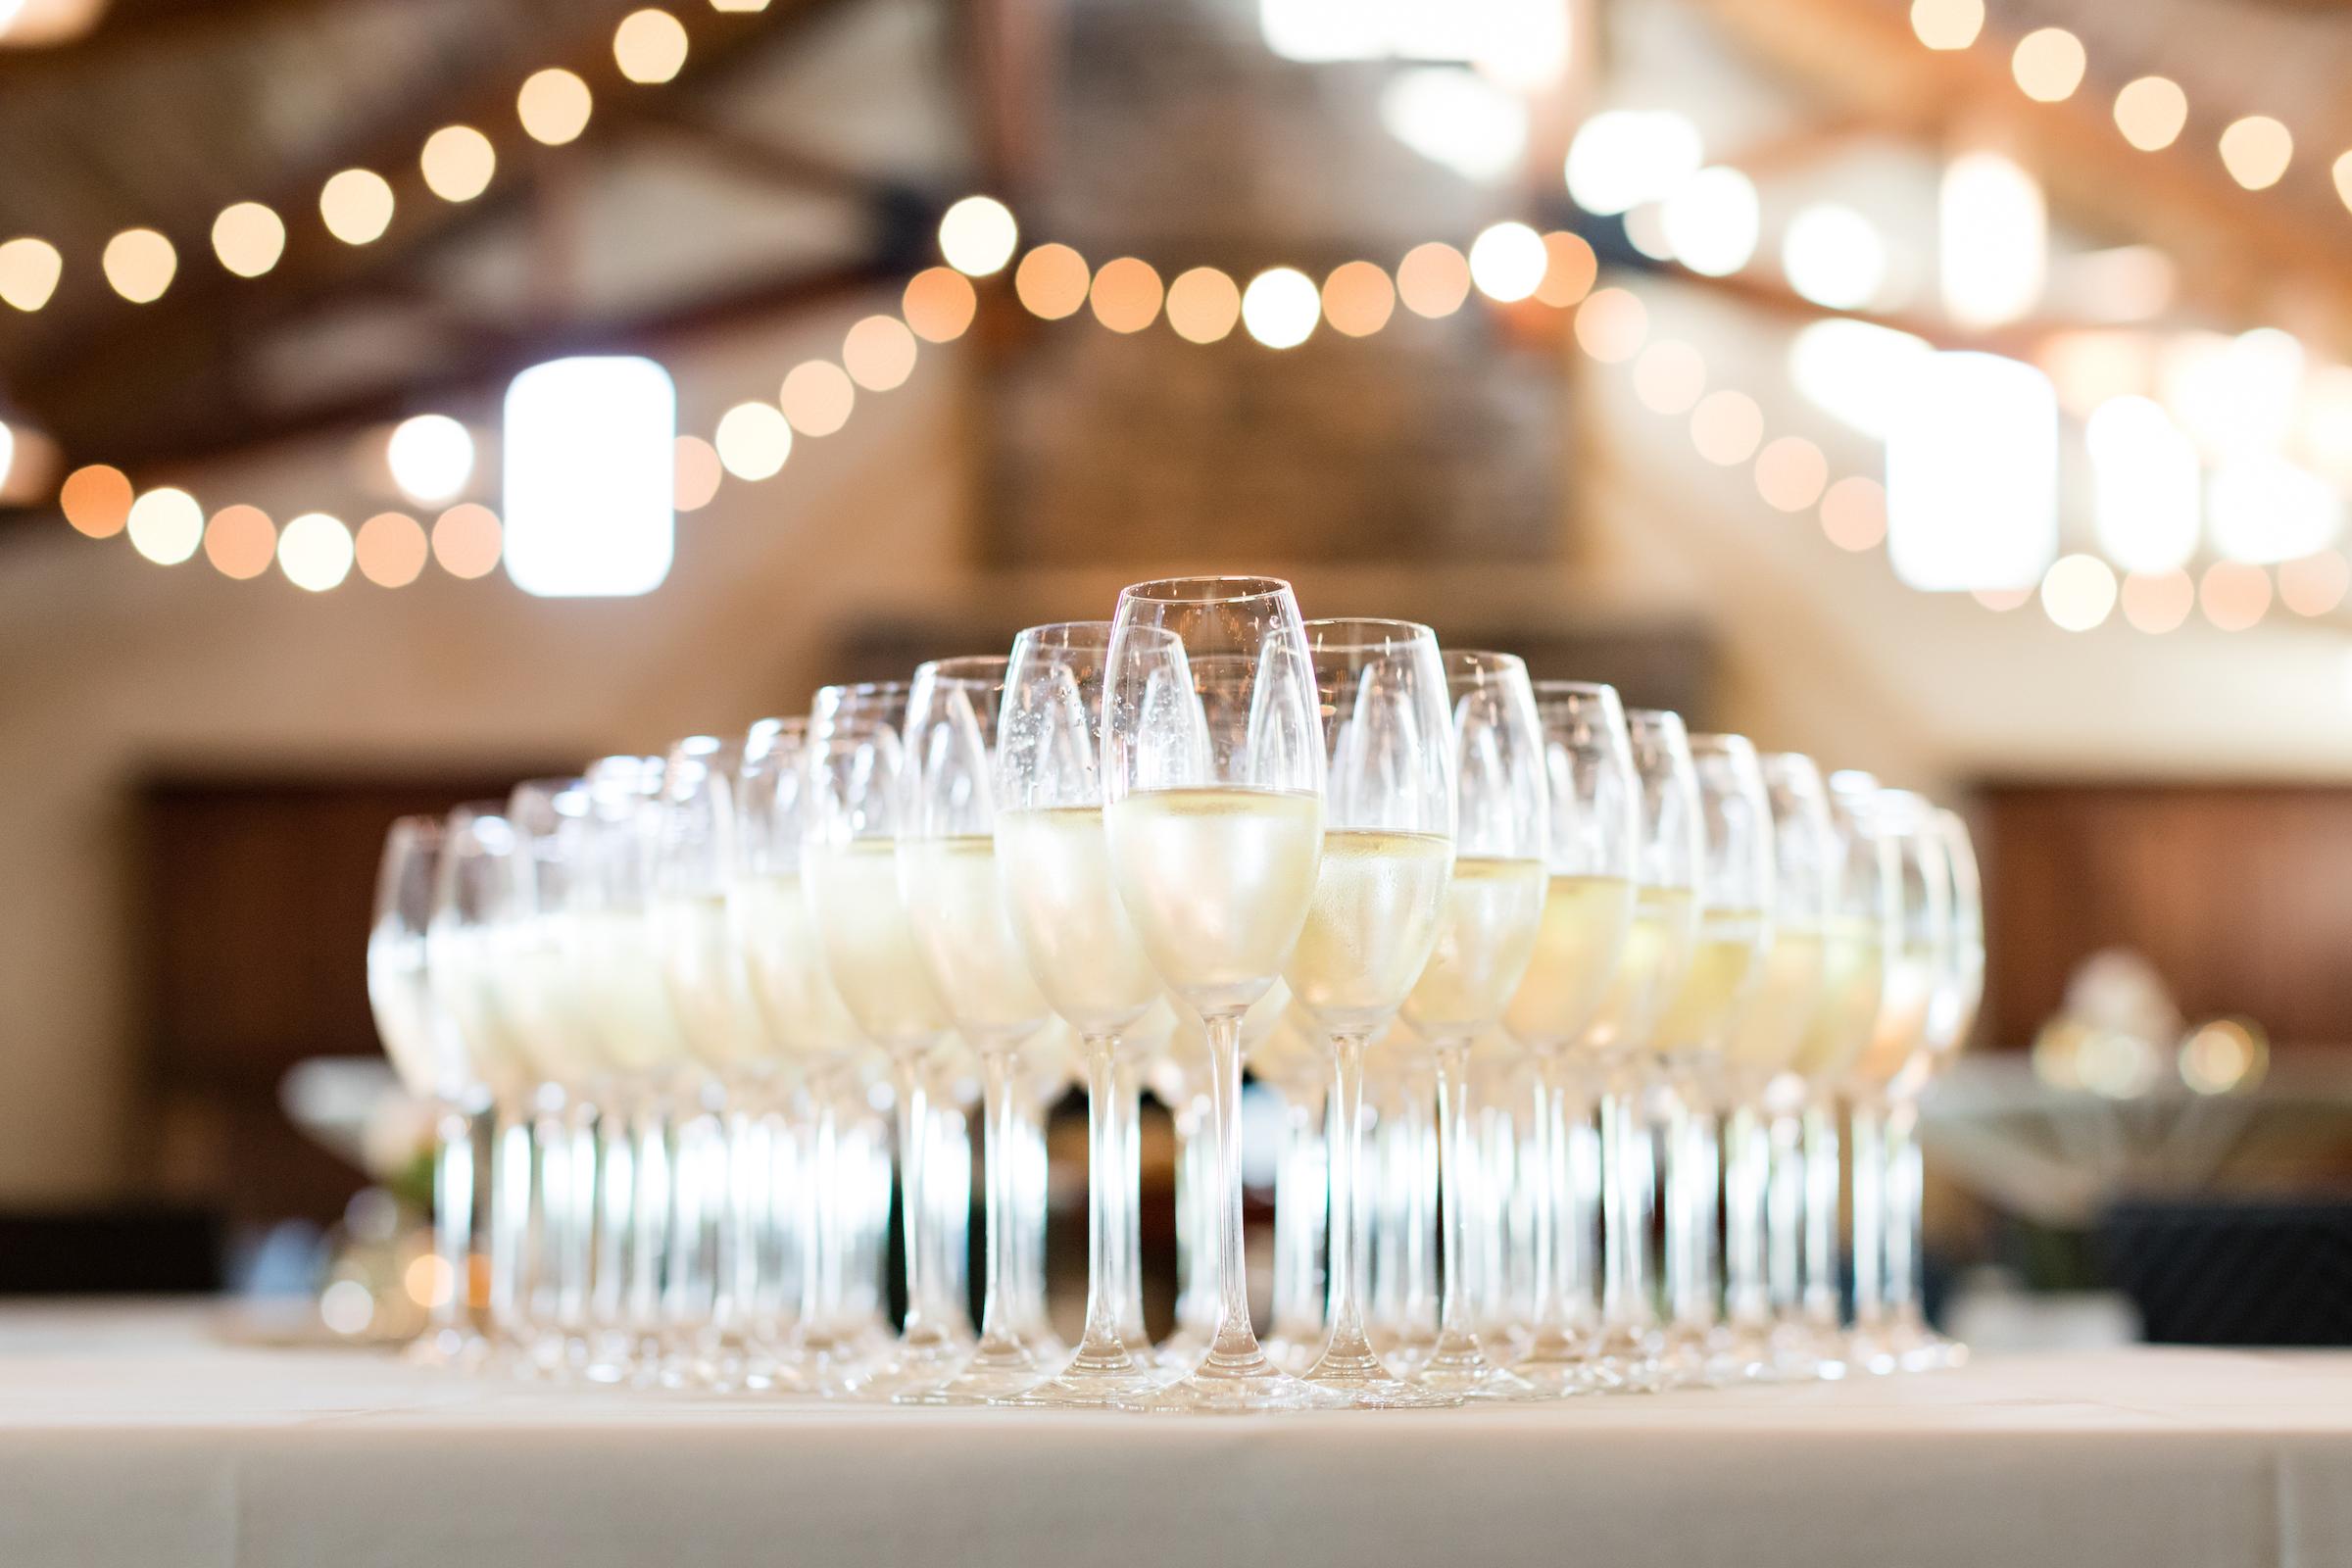 brielle-davis-events-kairos-photography-chandler-hill-wedding-reception-475.jpg